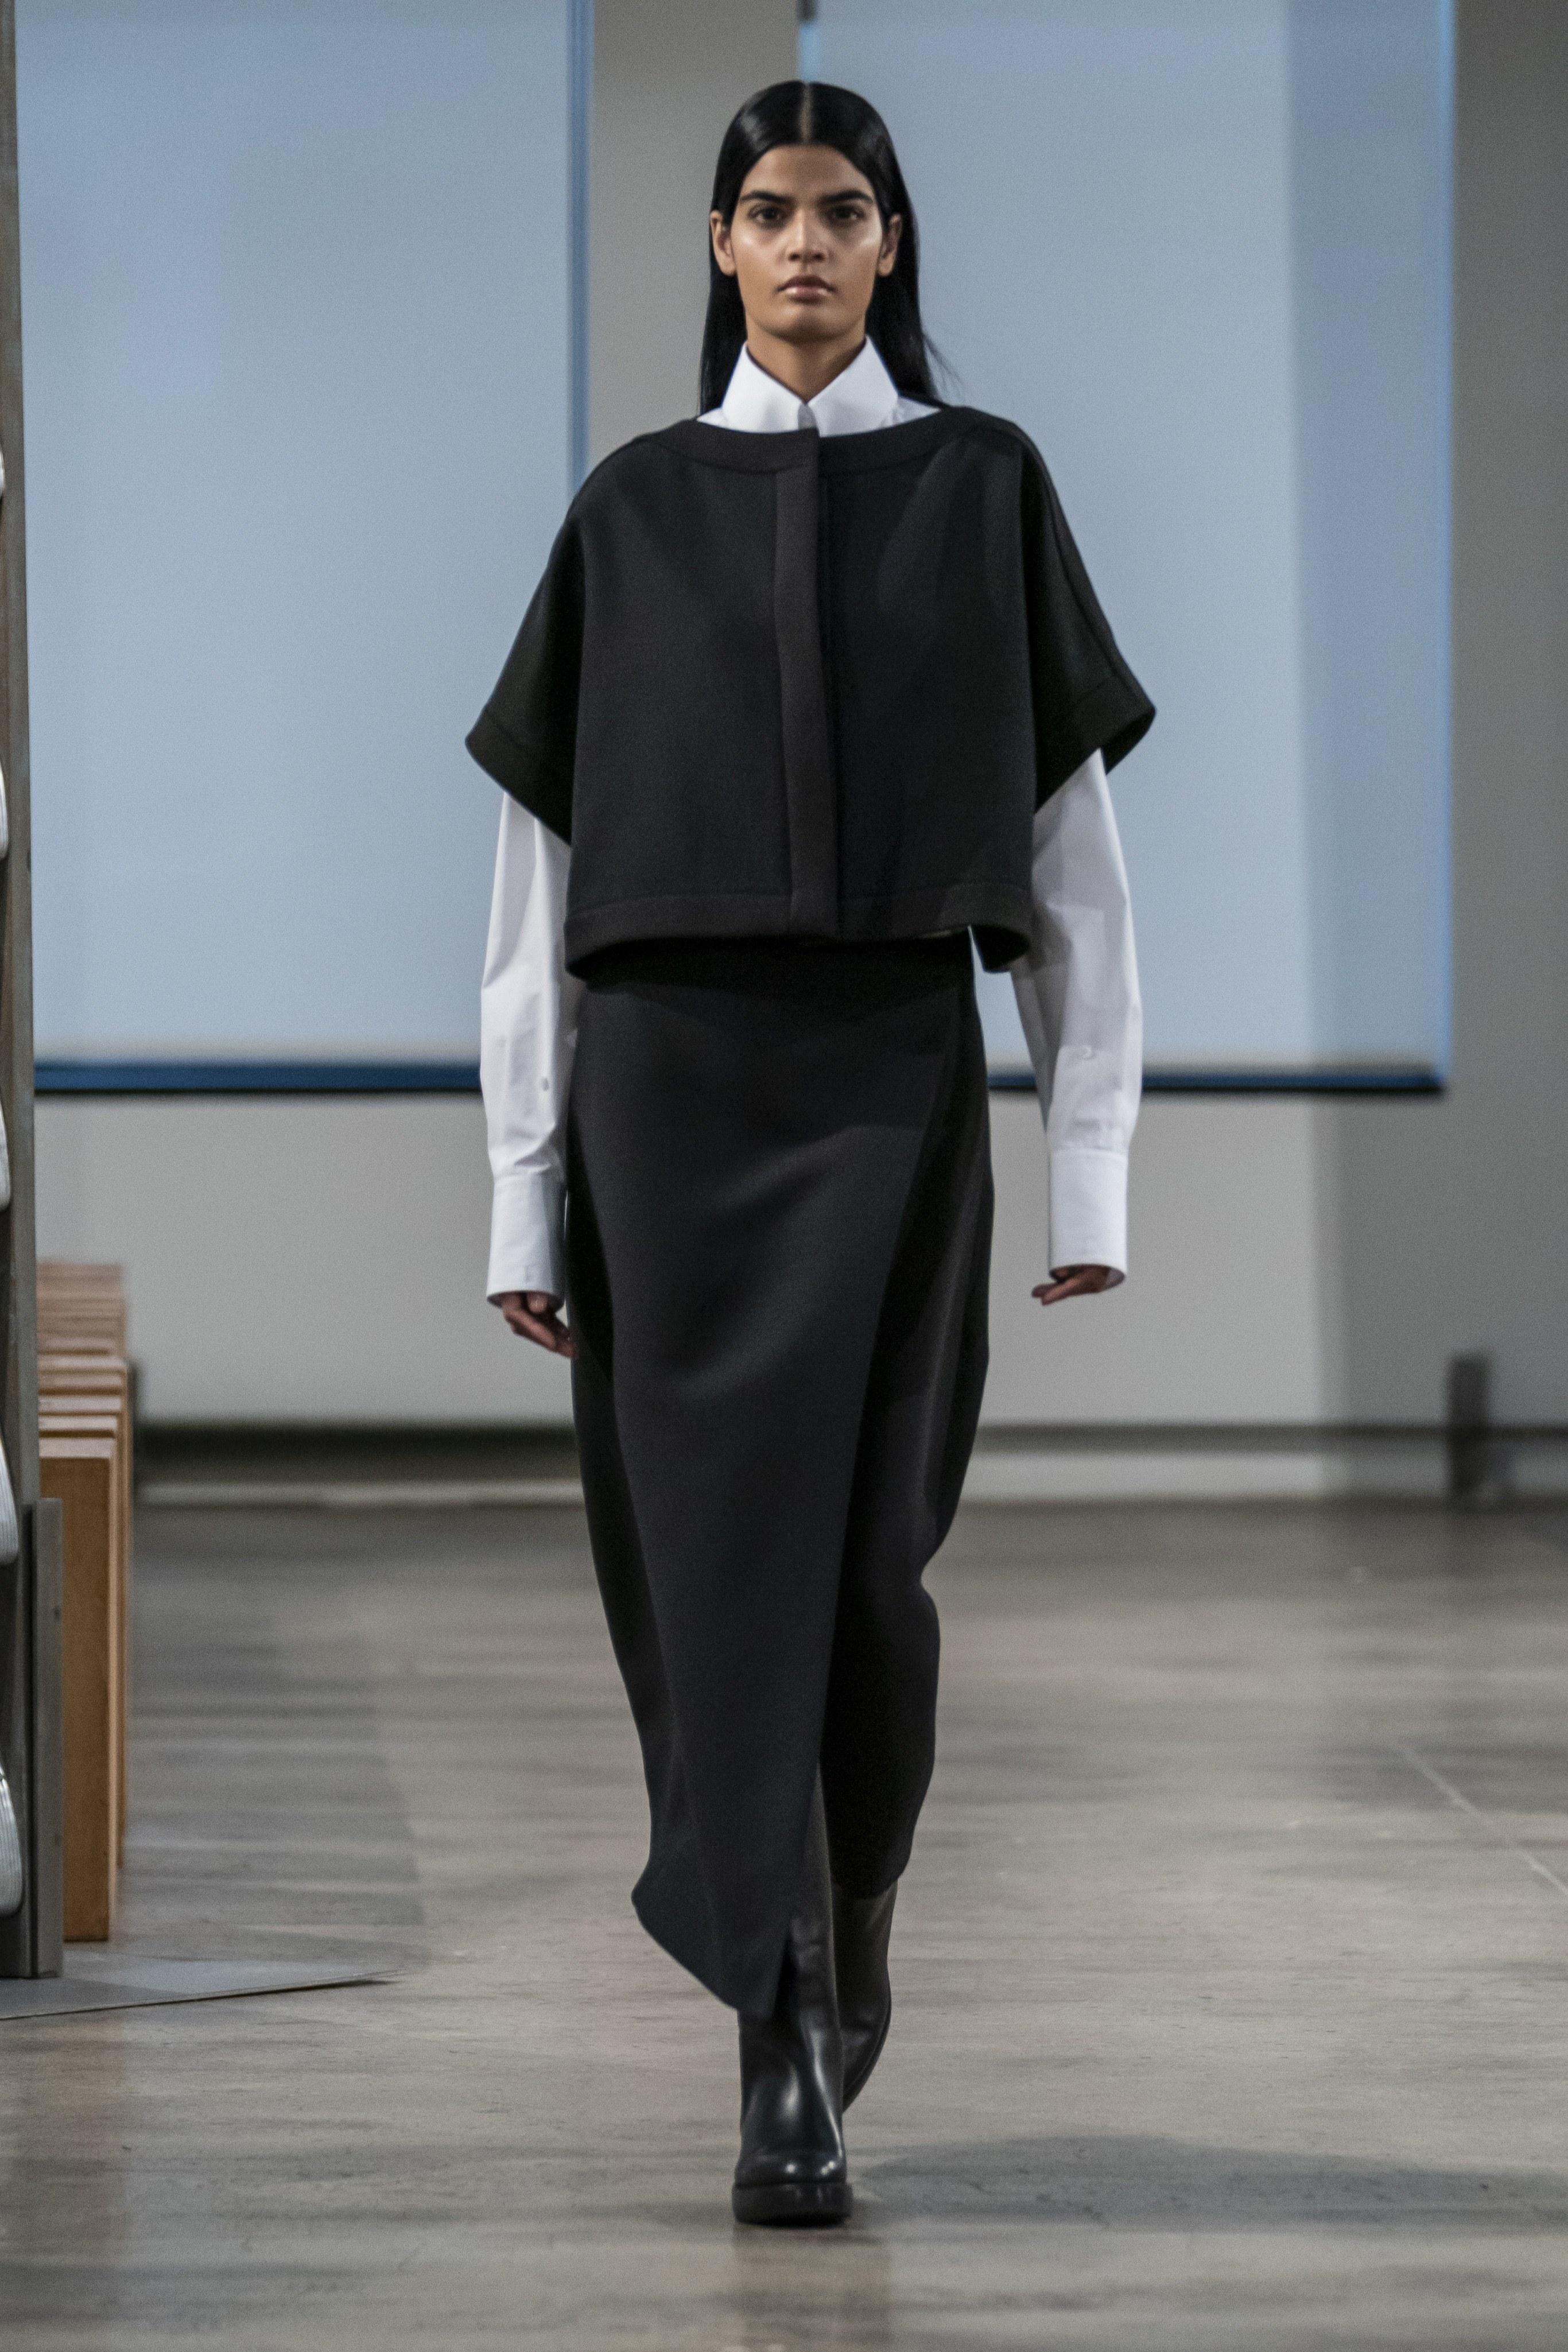 00028-The-Row-Fall-2019-ready-to-wear